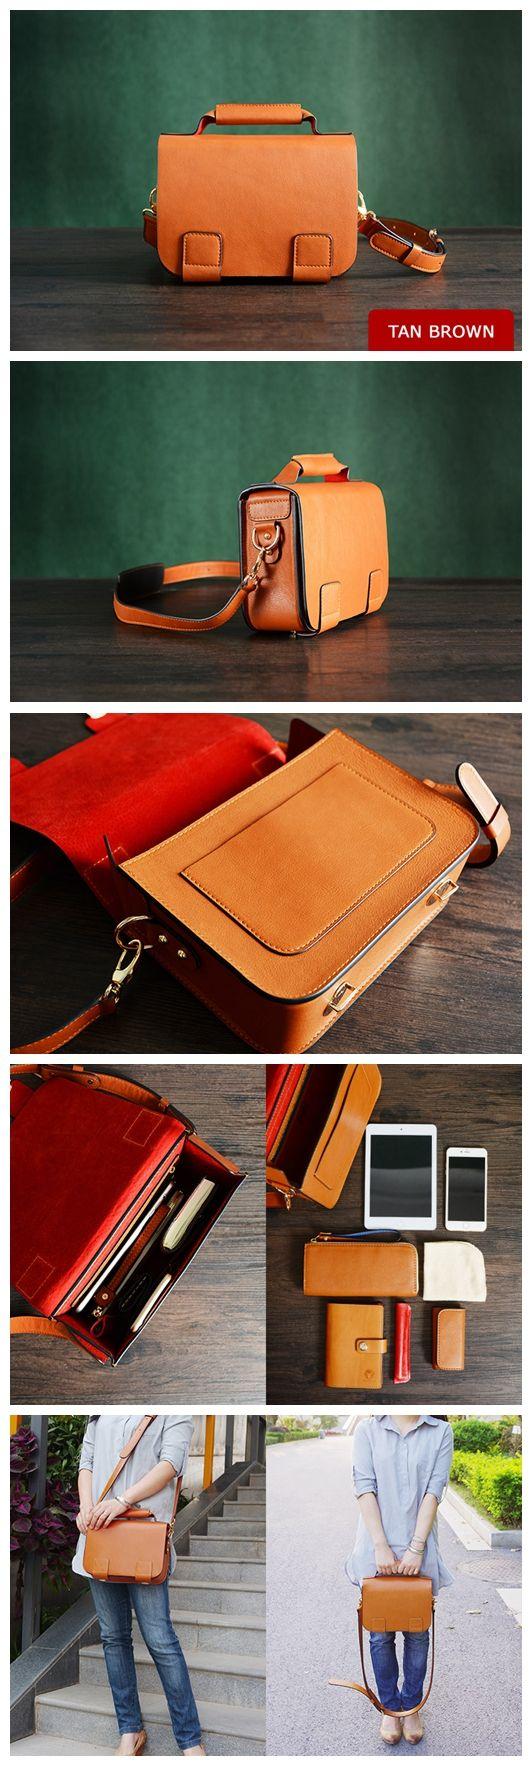 Custom Handmade Italian Vegetable Tan Brown Leather Satchel Bag, Messenger Bag, Shoulder Bag D002